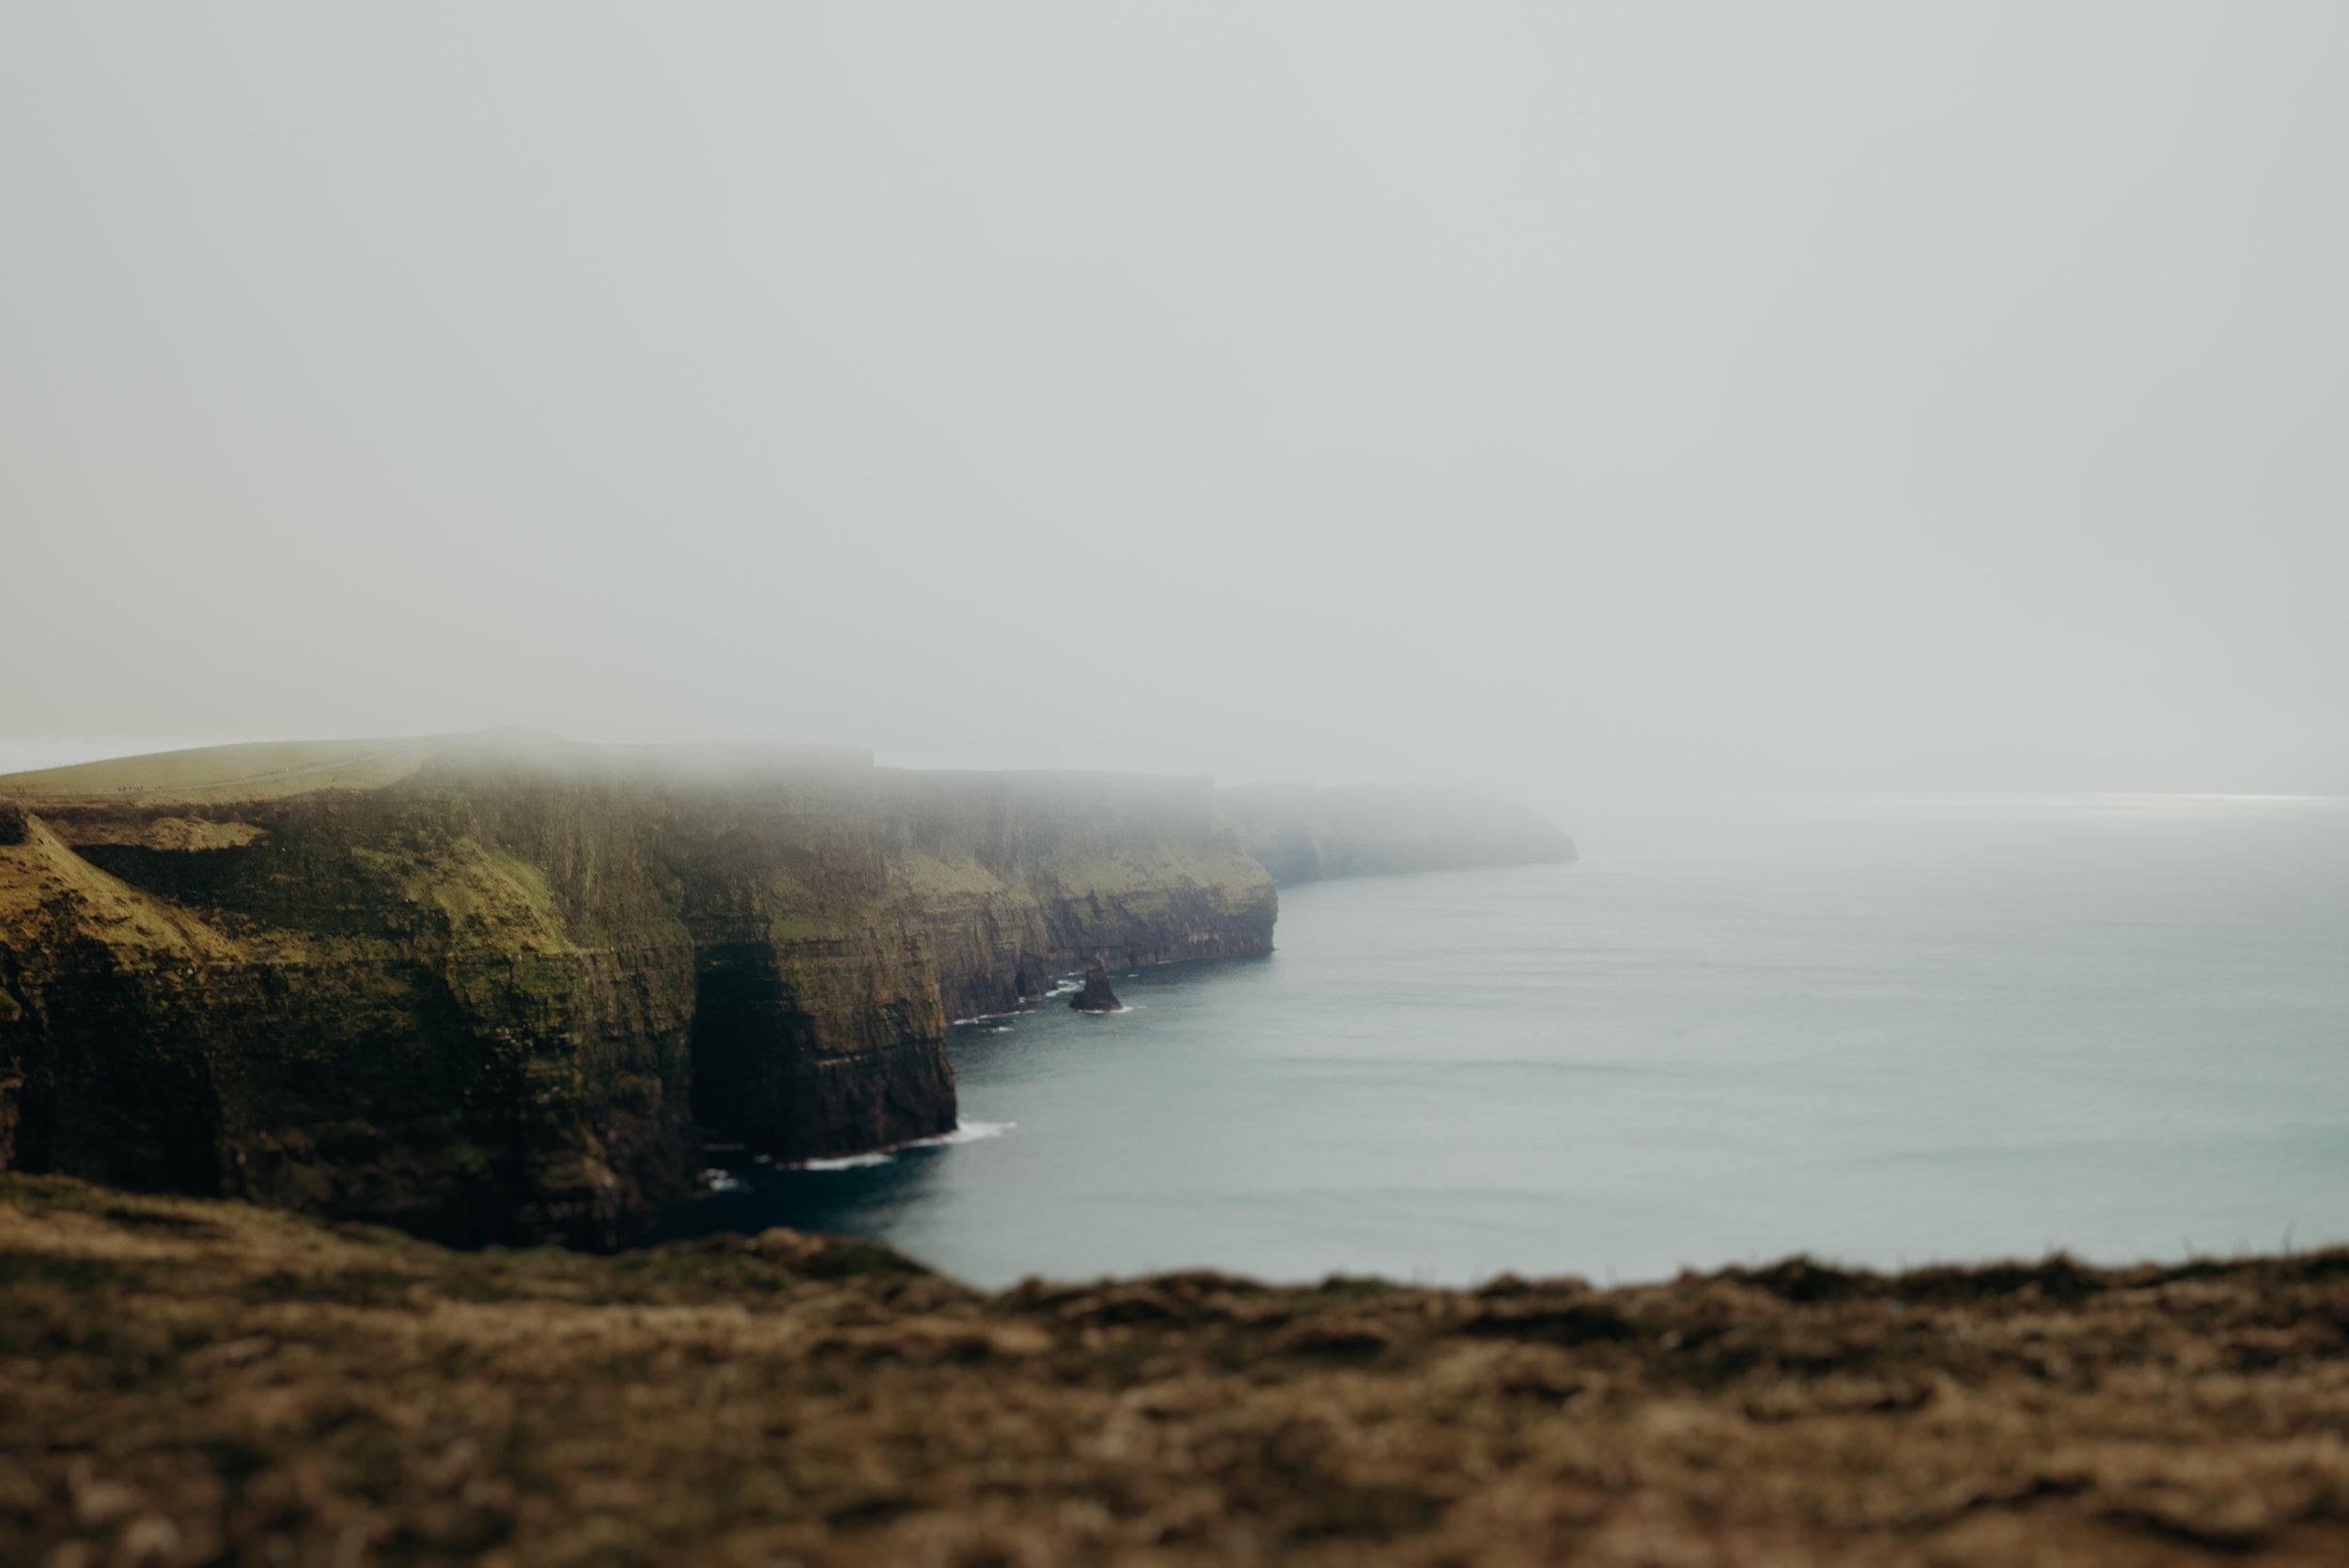 Cliffs Of Moher Engagement Session - Cliffs of Moher Proposal - Cliffs of Mhoer Elopement_5764-Edit-5.jpg